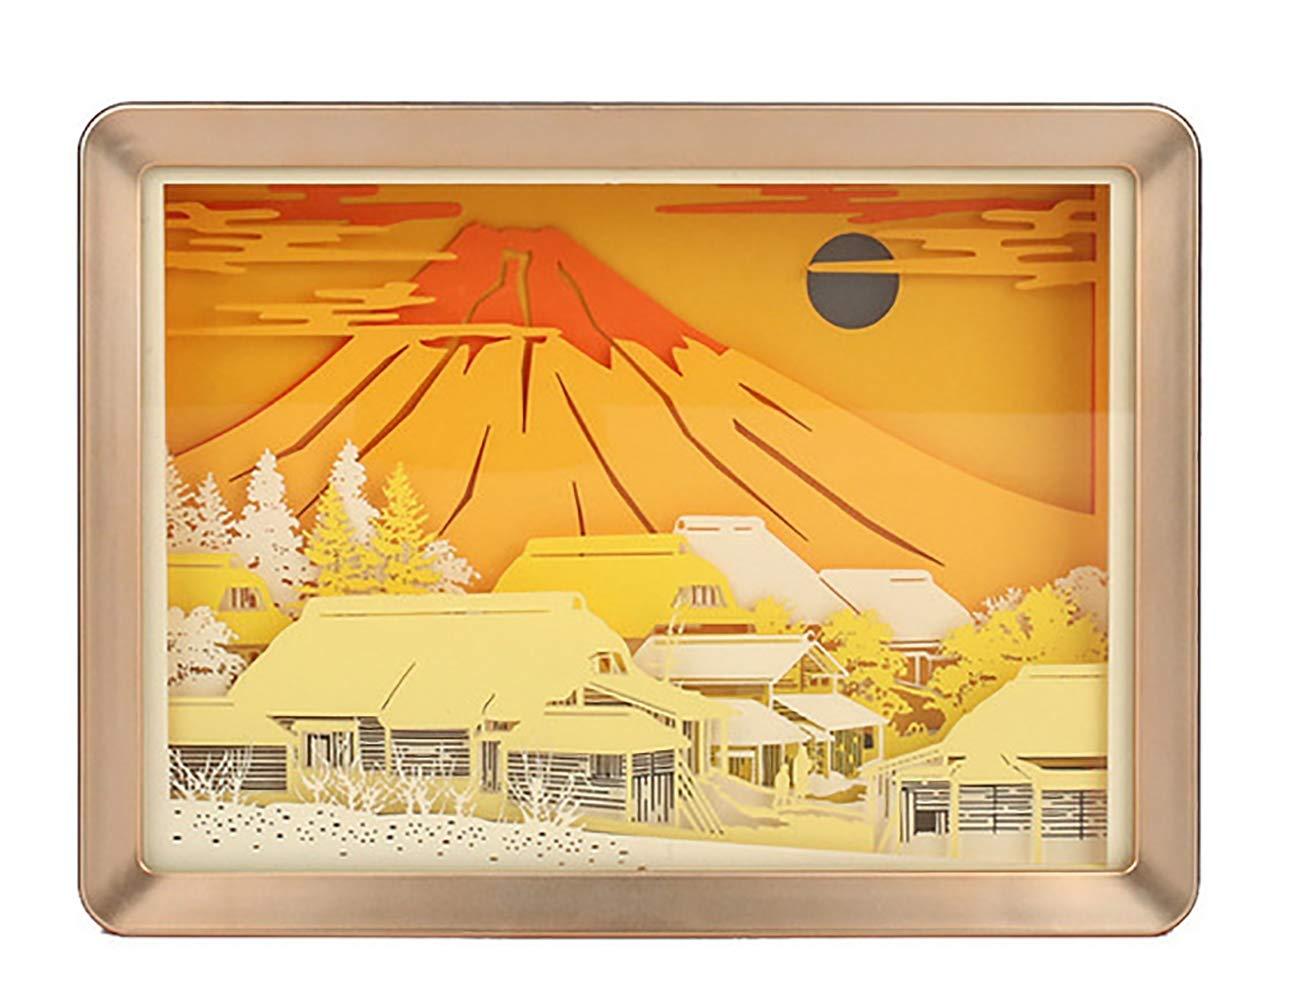 Mount Fuji Mood Night Light Romantic Atmosphere Lover CHSHY 3D Paper Carving Lampe Night LED Paper Cut Shadow Light Box